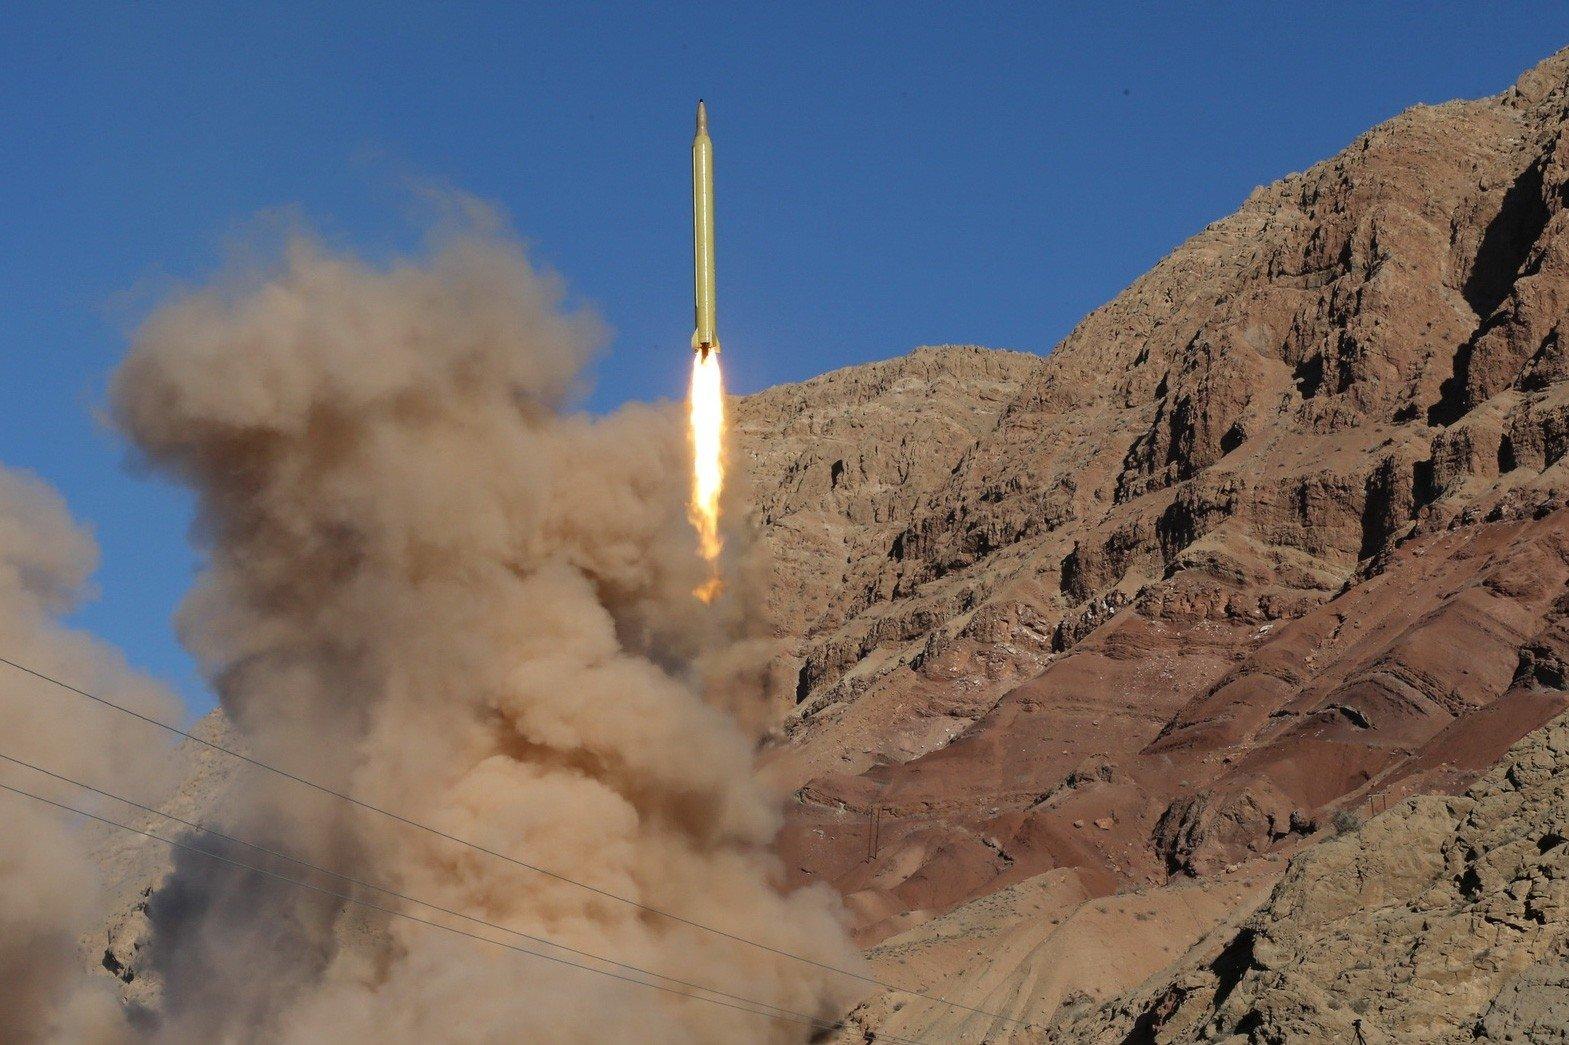 ВИране благополучно провели тестирования баллистической ракеты